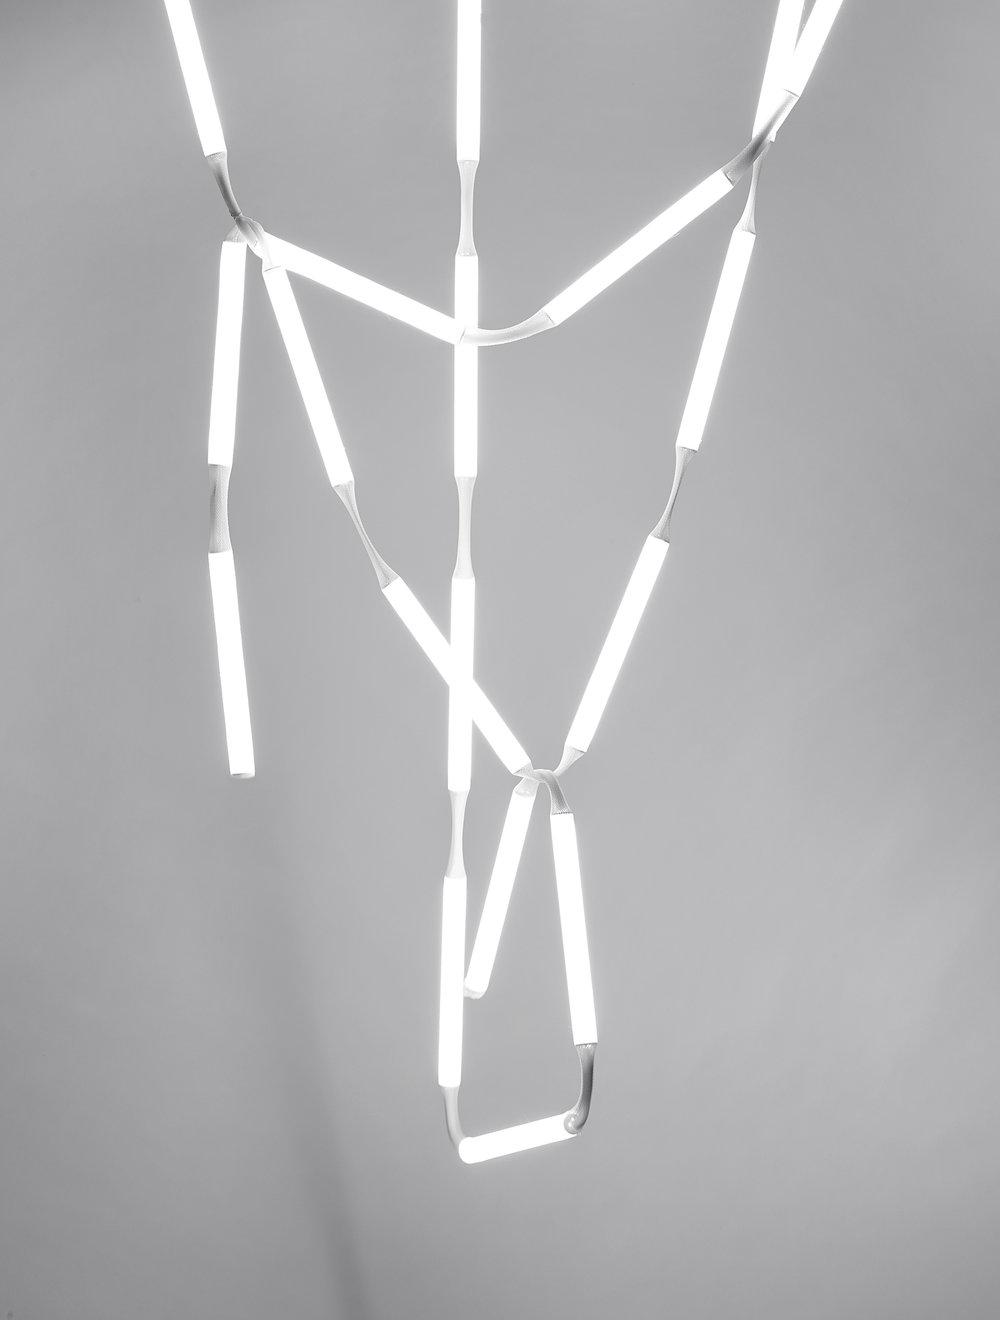 Verena-Hennig-Rope-Light-Chandelier.jpg